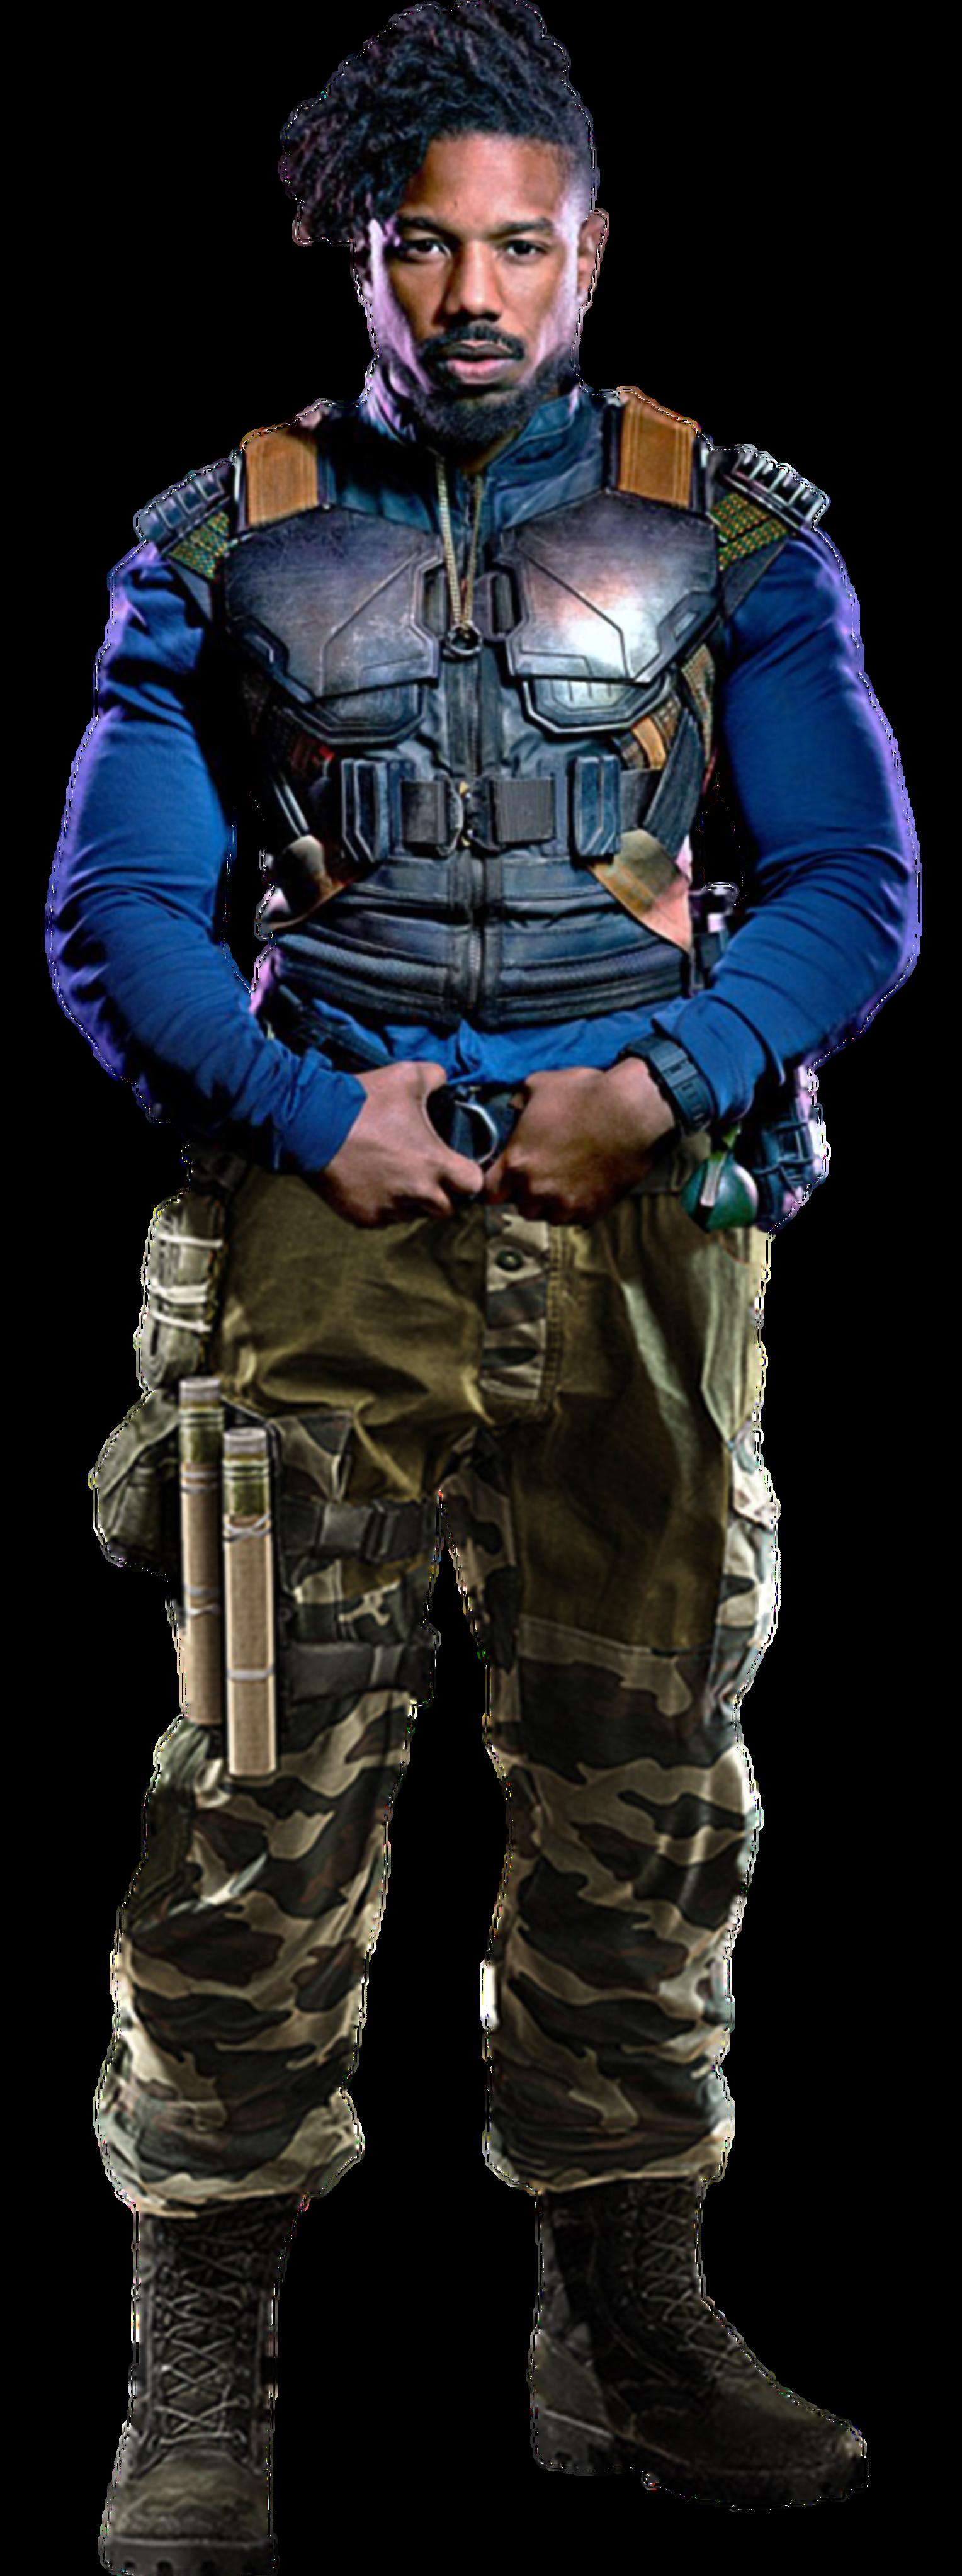 Erik Killmonger (Marvel Cinematic Universe)